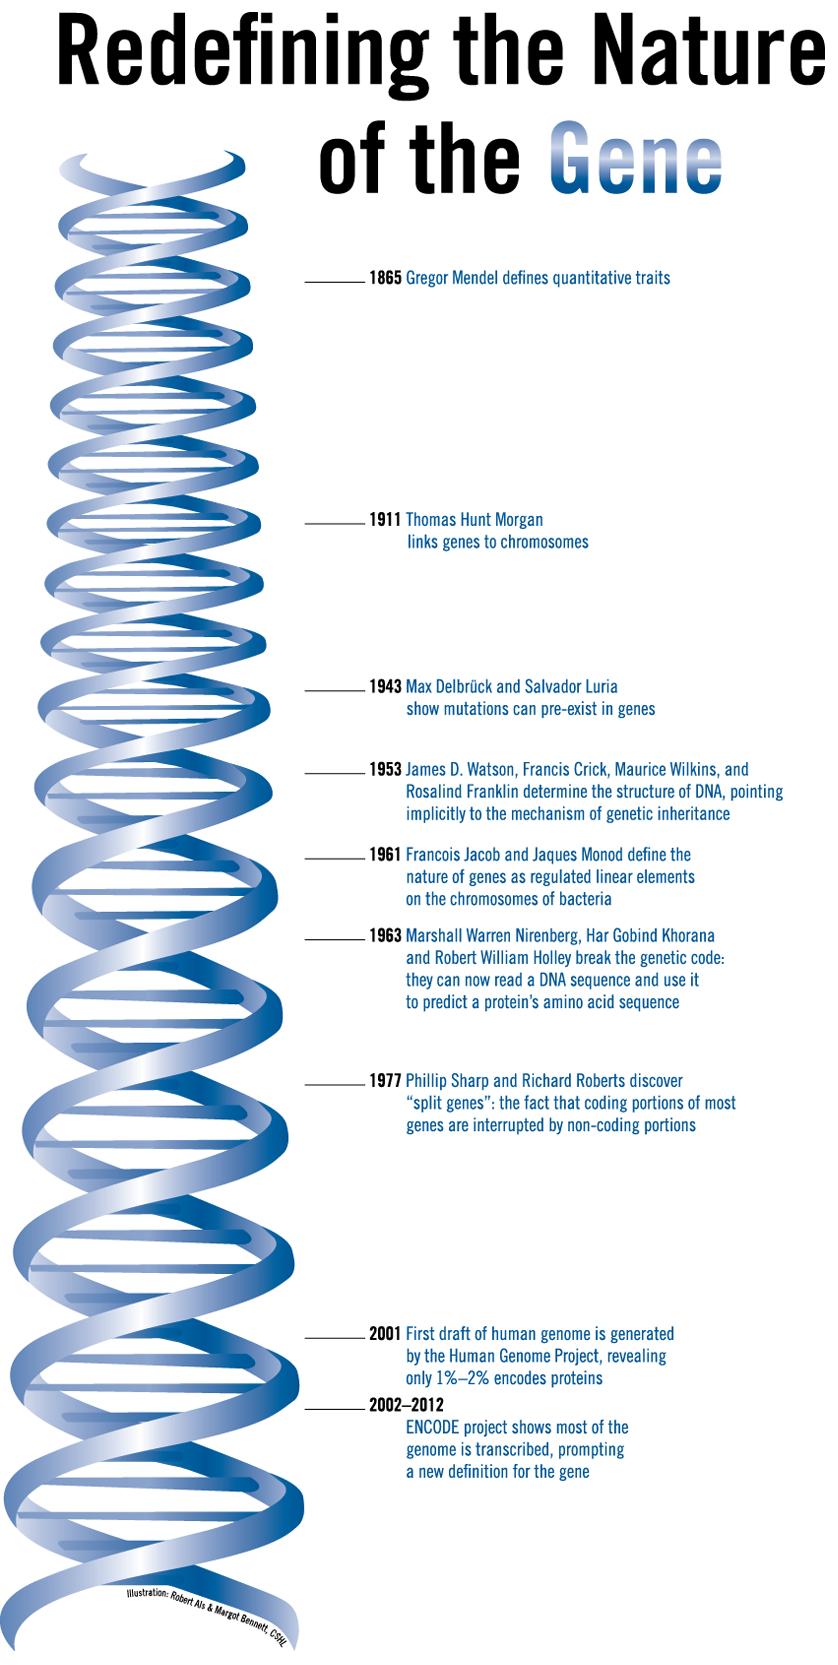 pin by kirsley chennen on dna | pinterest | genetics, molecular